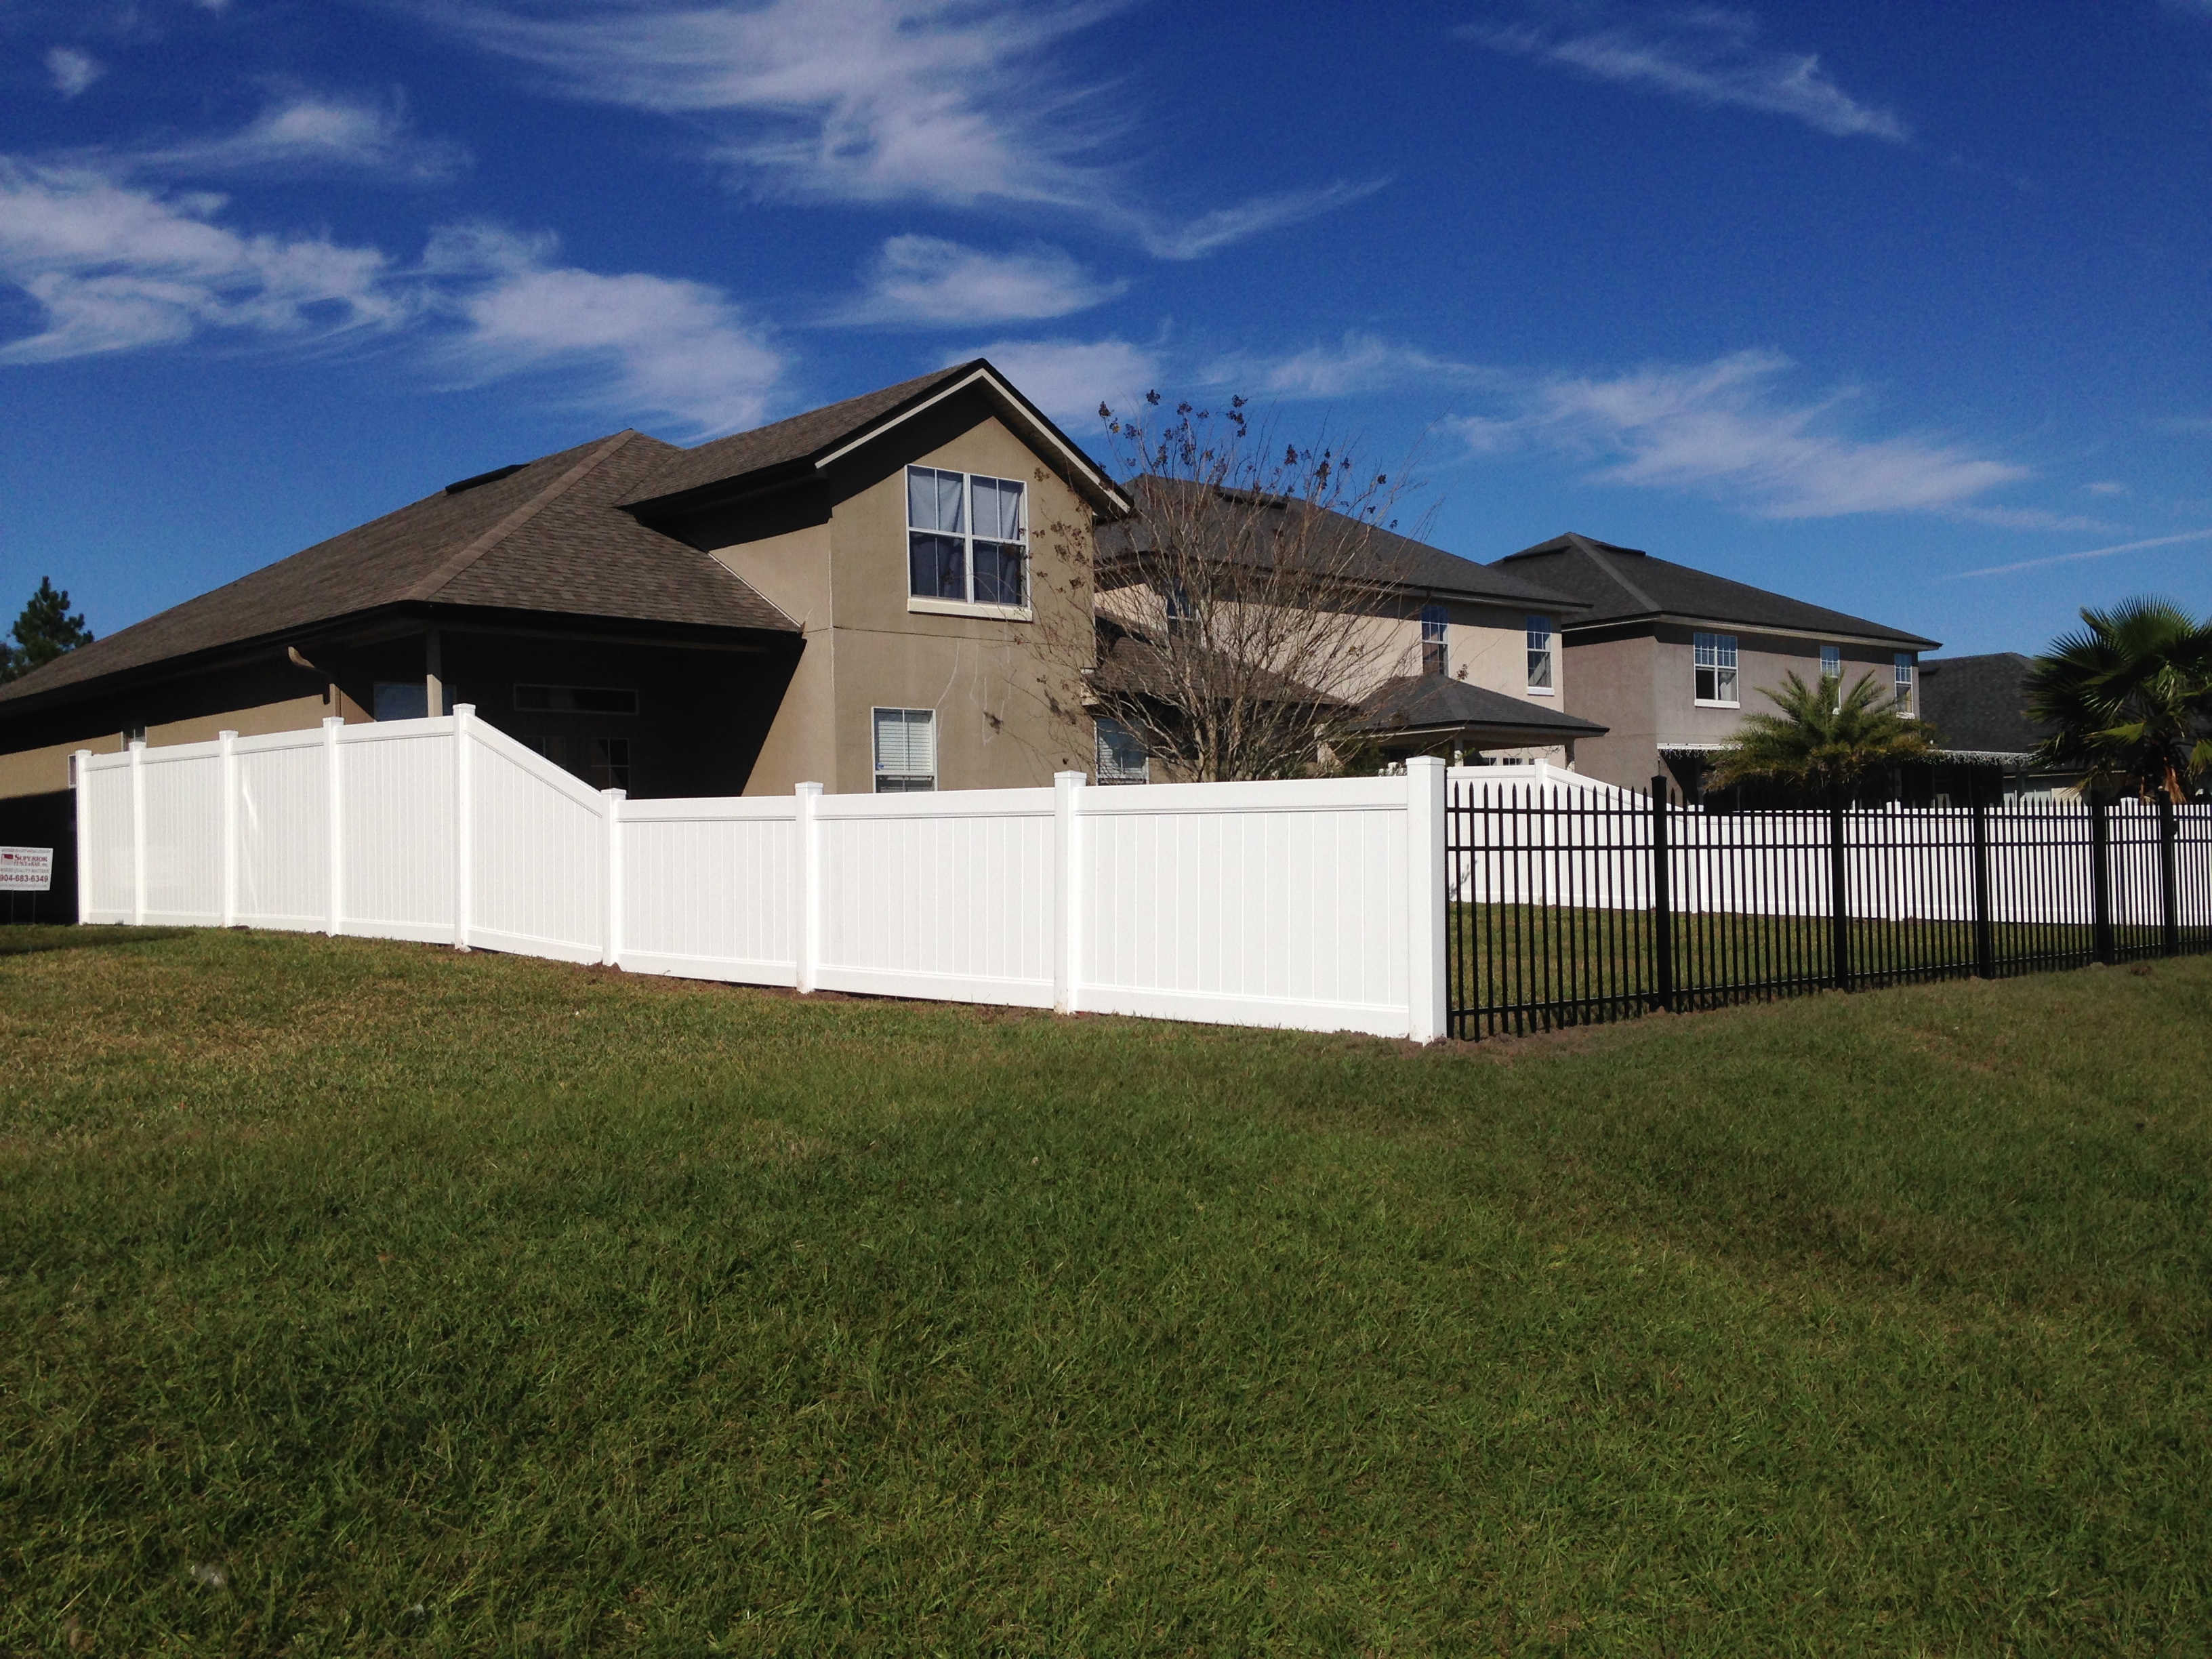 Orlando Fence Company Superior Fence Amp Rail 407 232 7009